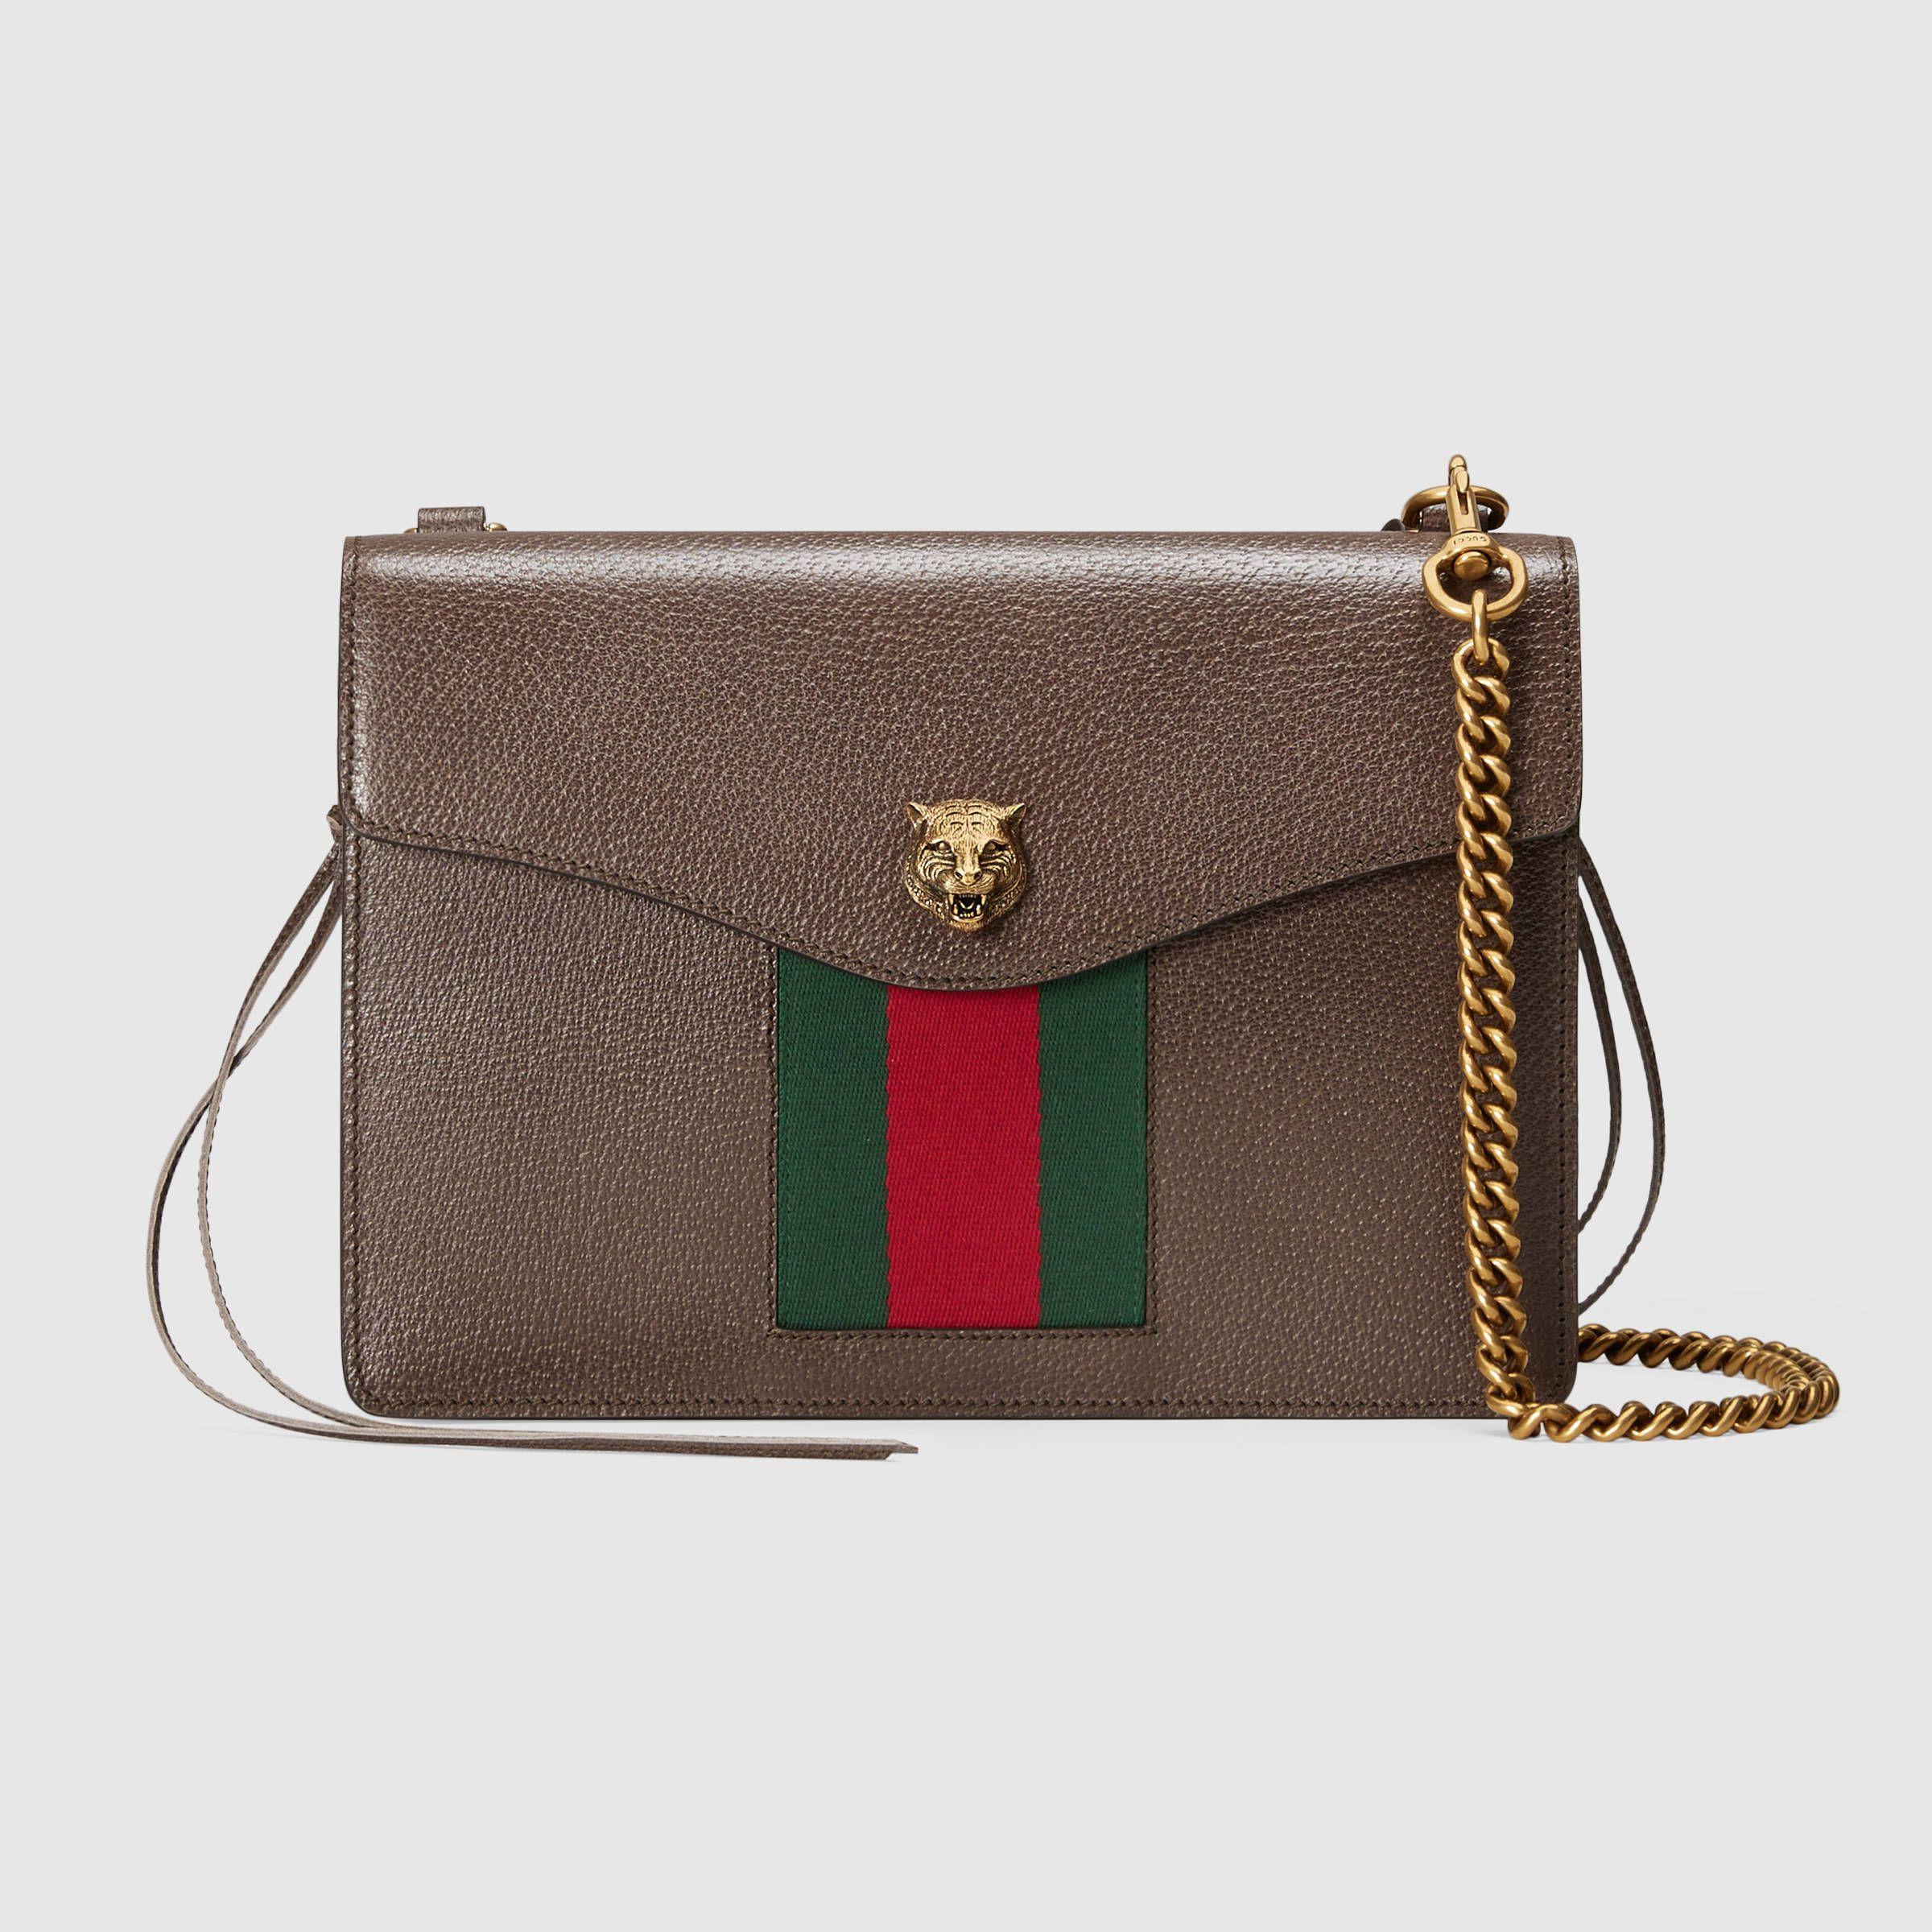 d7f19b614effcb Pin by Kat Ha on Handbags, SLGs, and such | Pinterest | Gucci ...